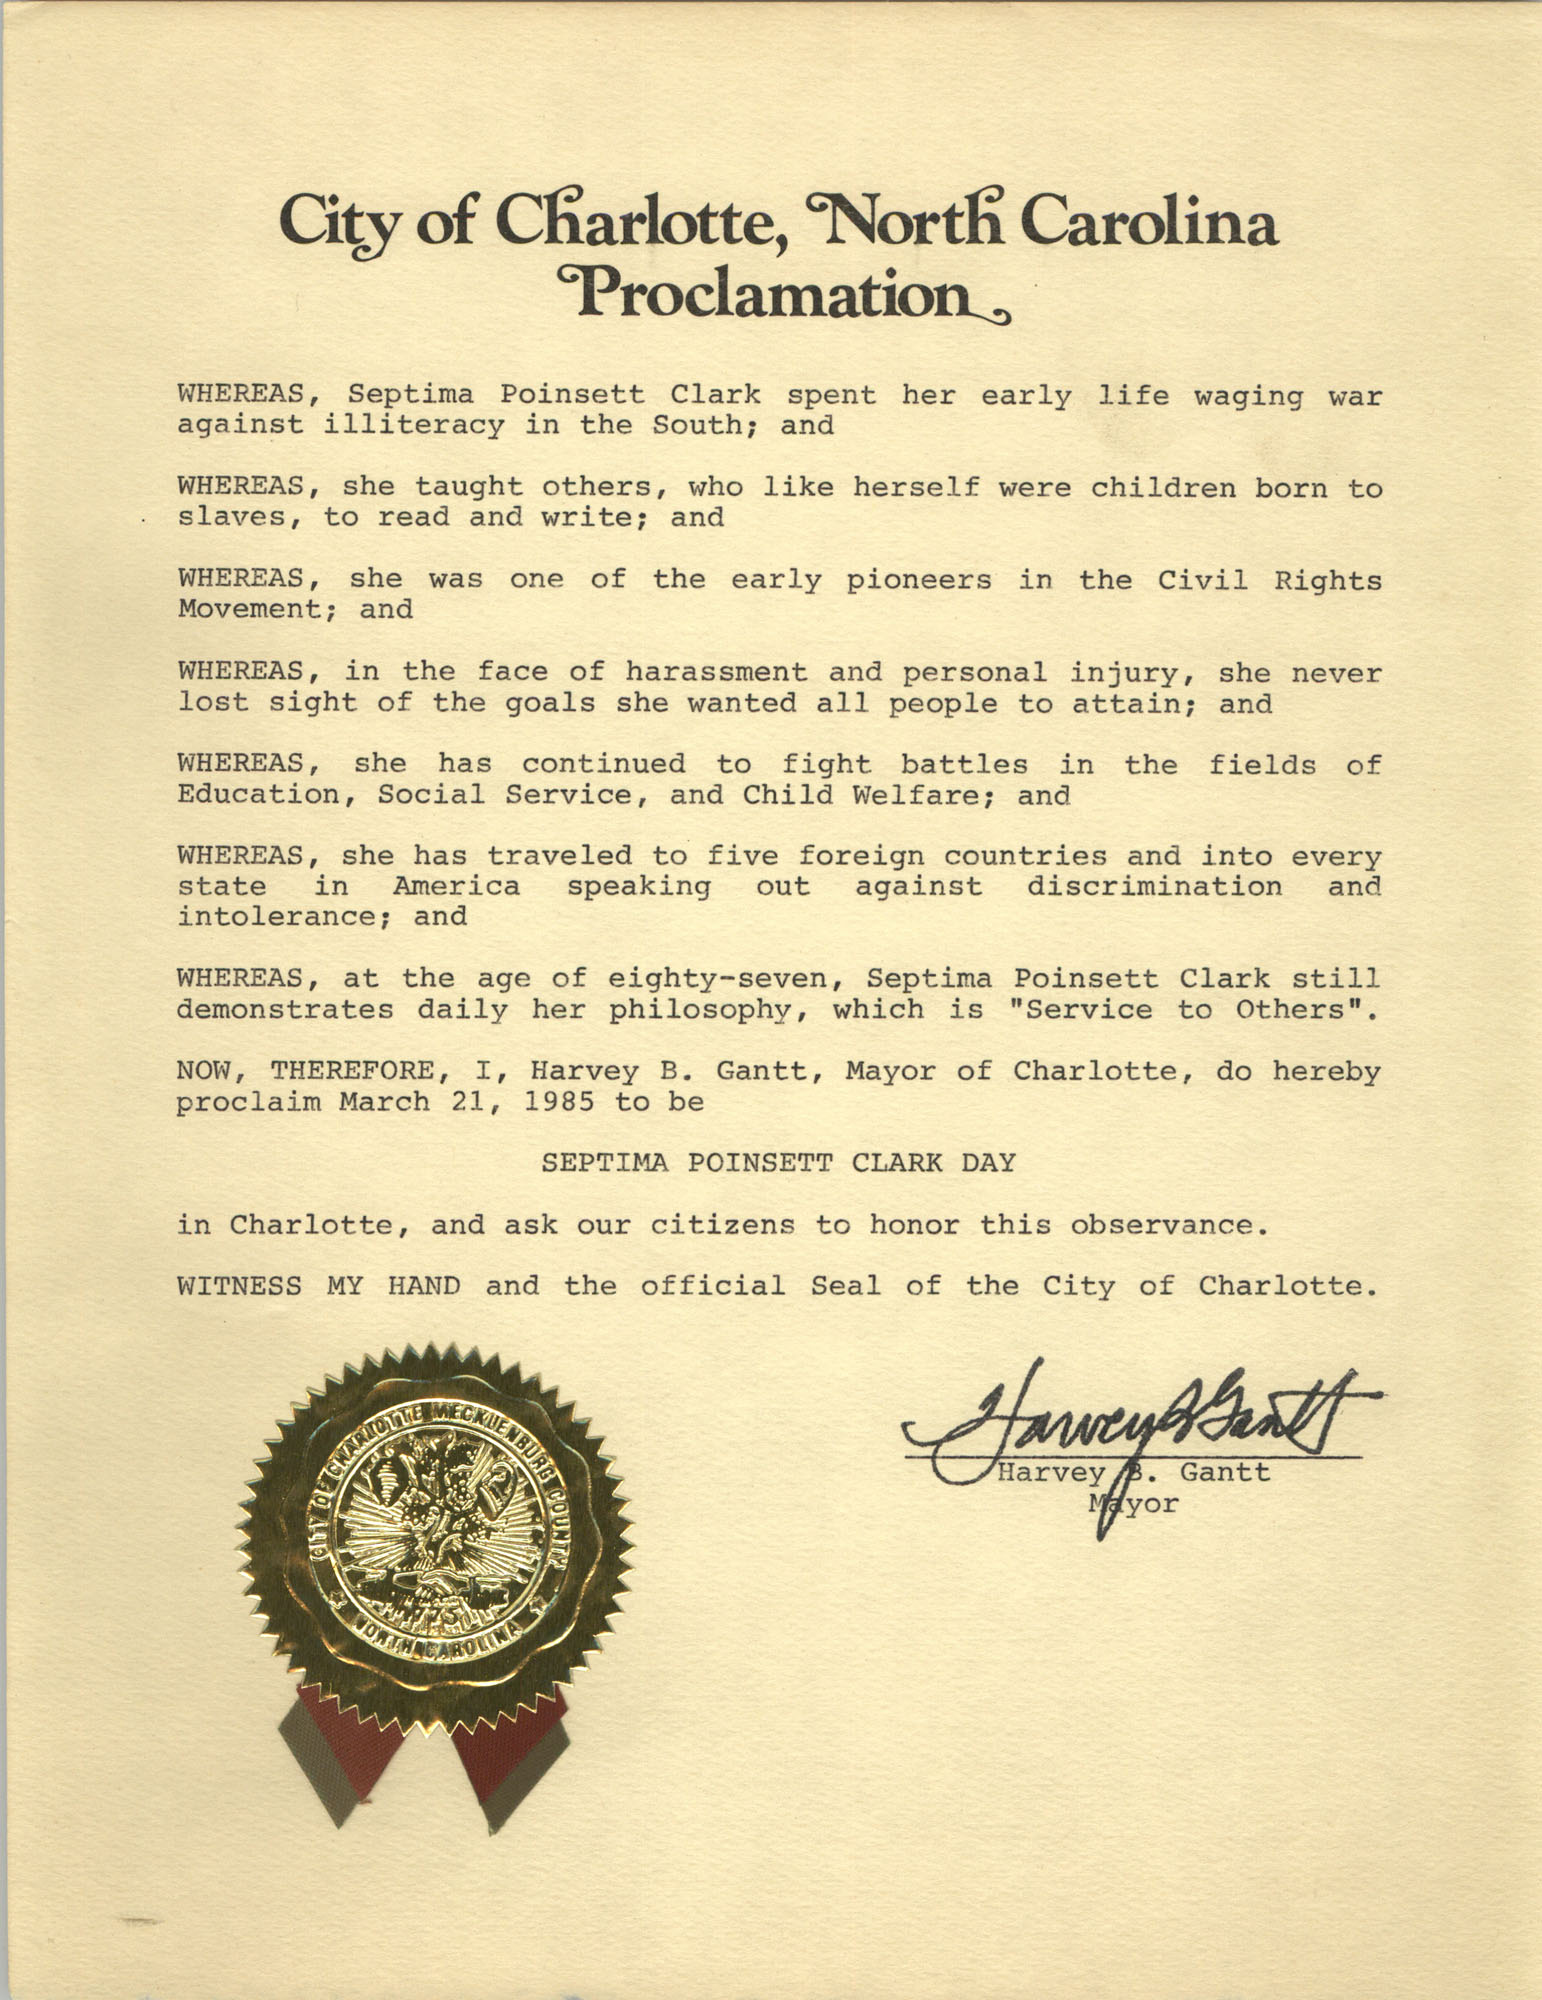 Proclamation, March 21, 1985